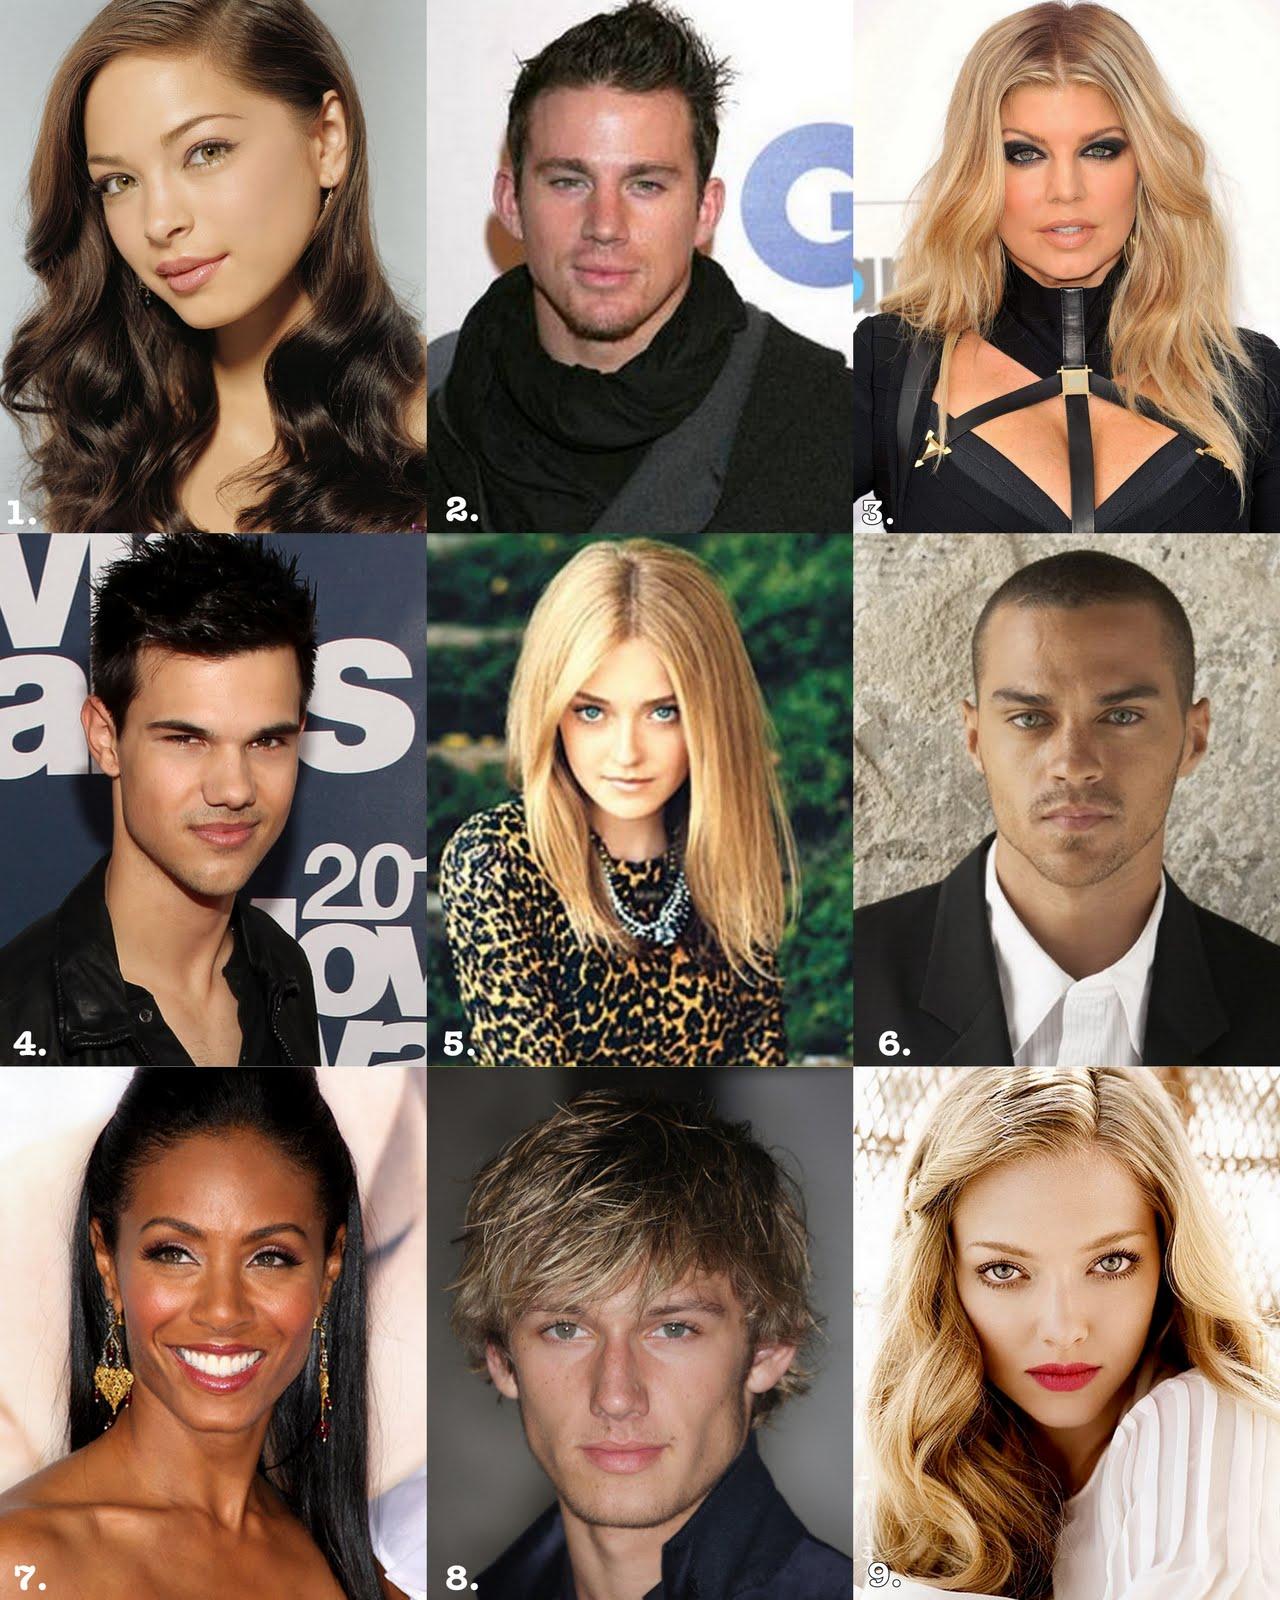 http://1.bp.blogspot.com/--NpTFdkdPsw/TiNdlamGBKI/AAAAAAAABB0/8weSCA7DmFo/s1600/vampire+diaries2.jpg